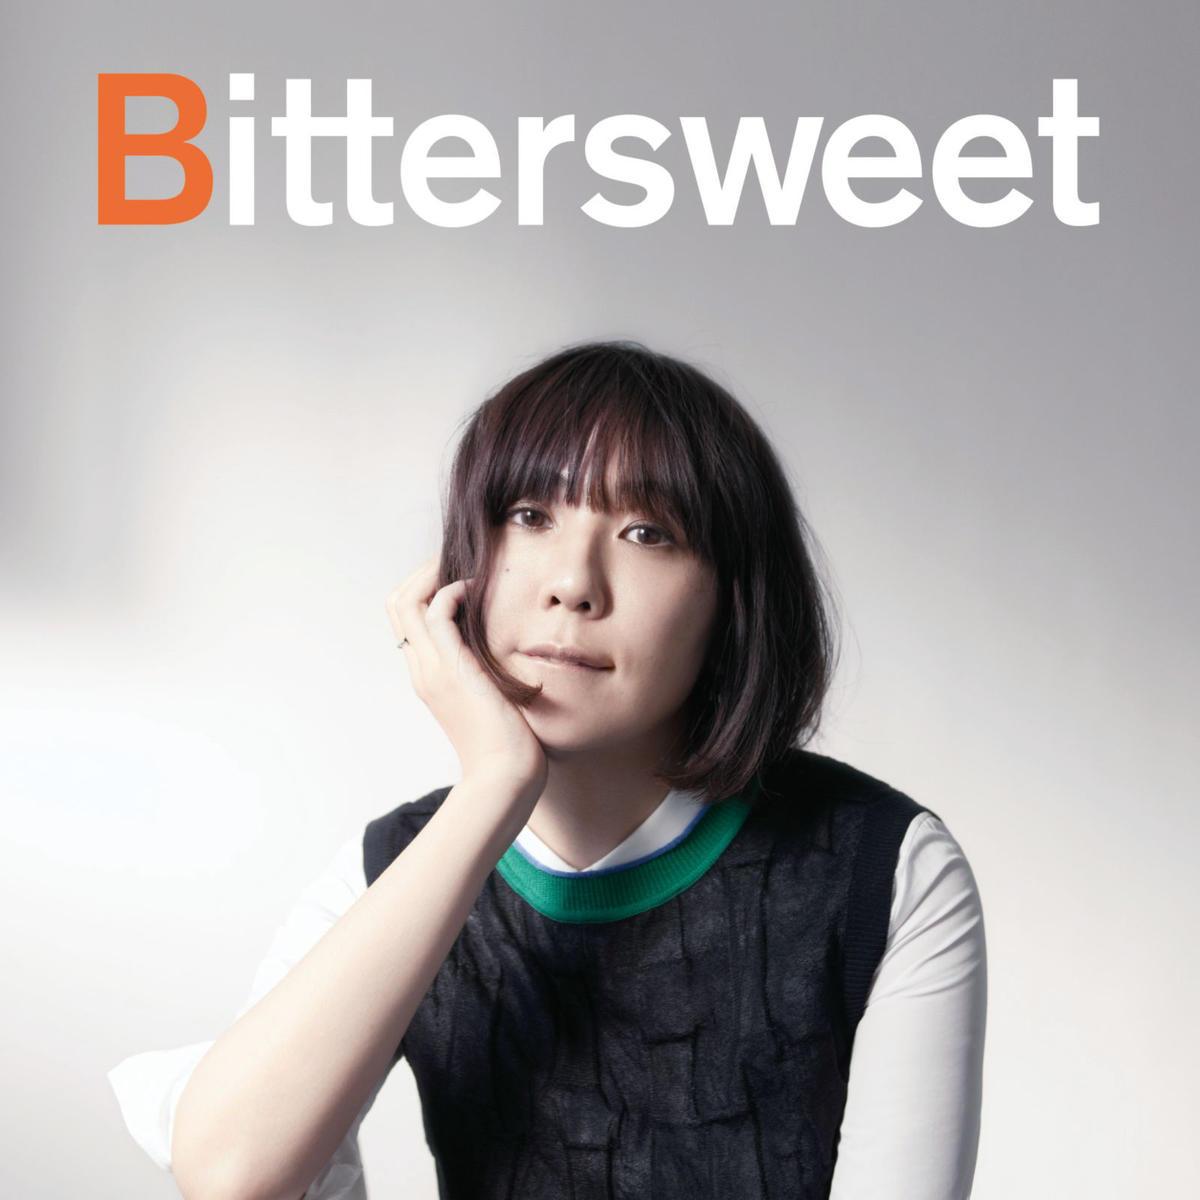 20161029.21.12 Toki Asako - Bittersweet cover.jpg